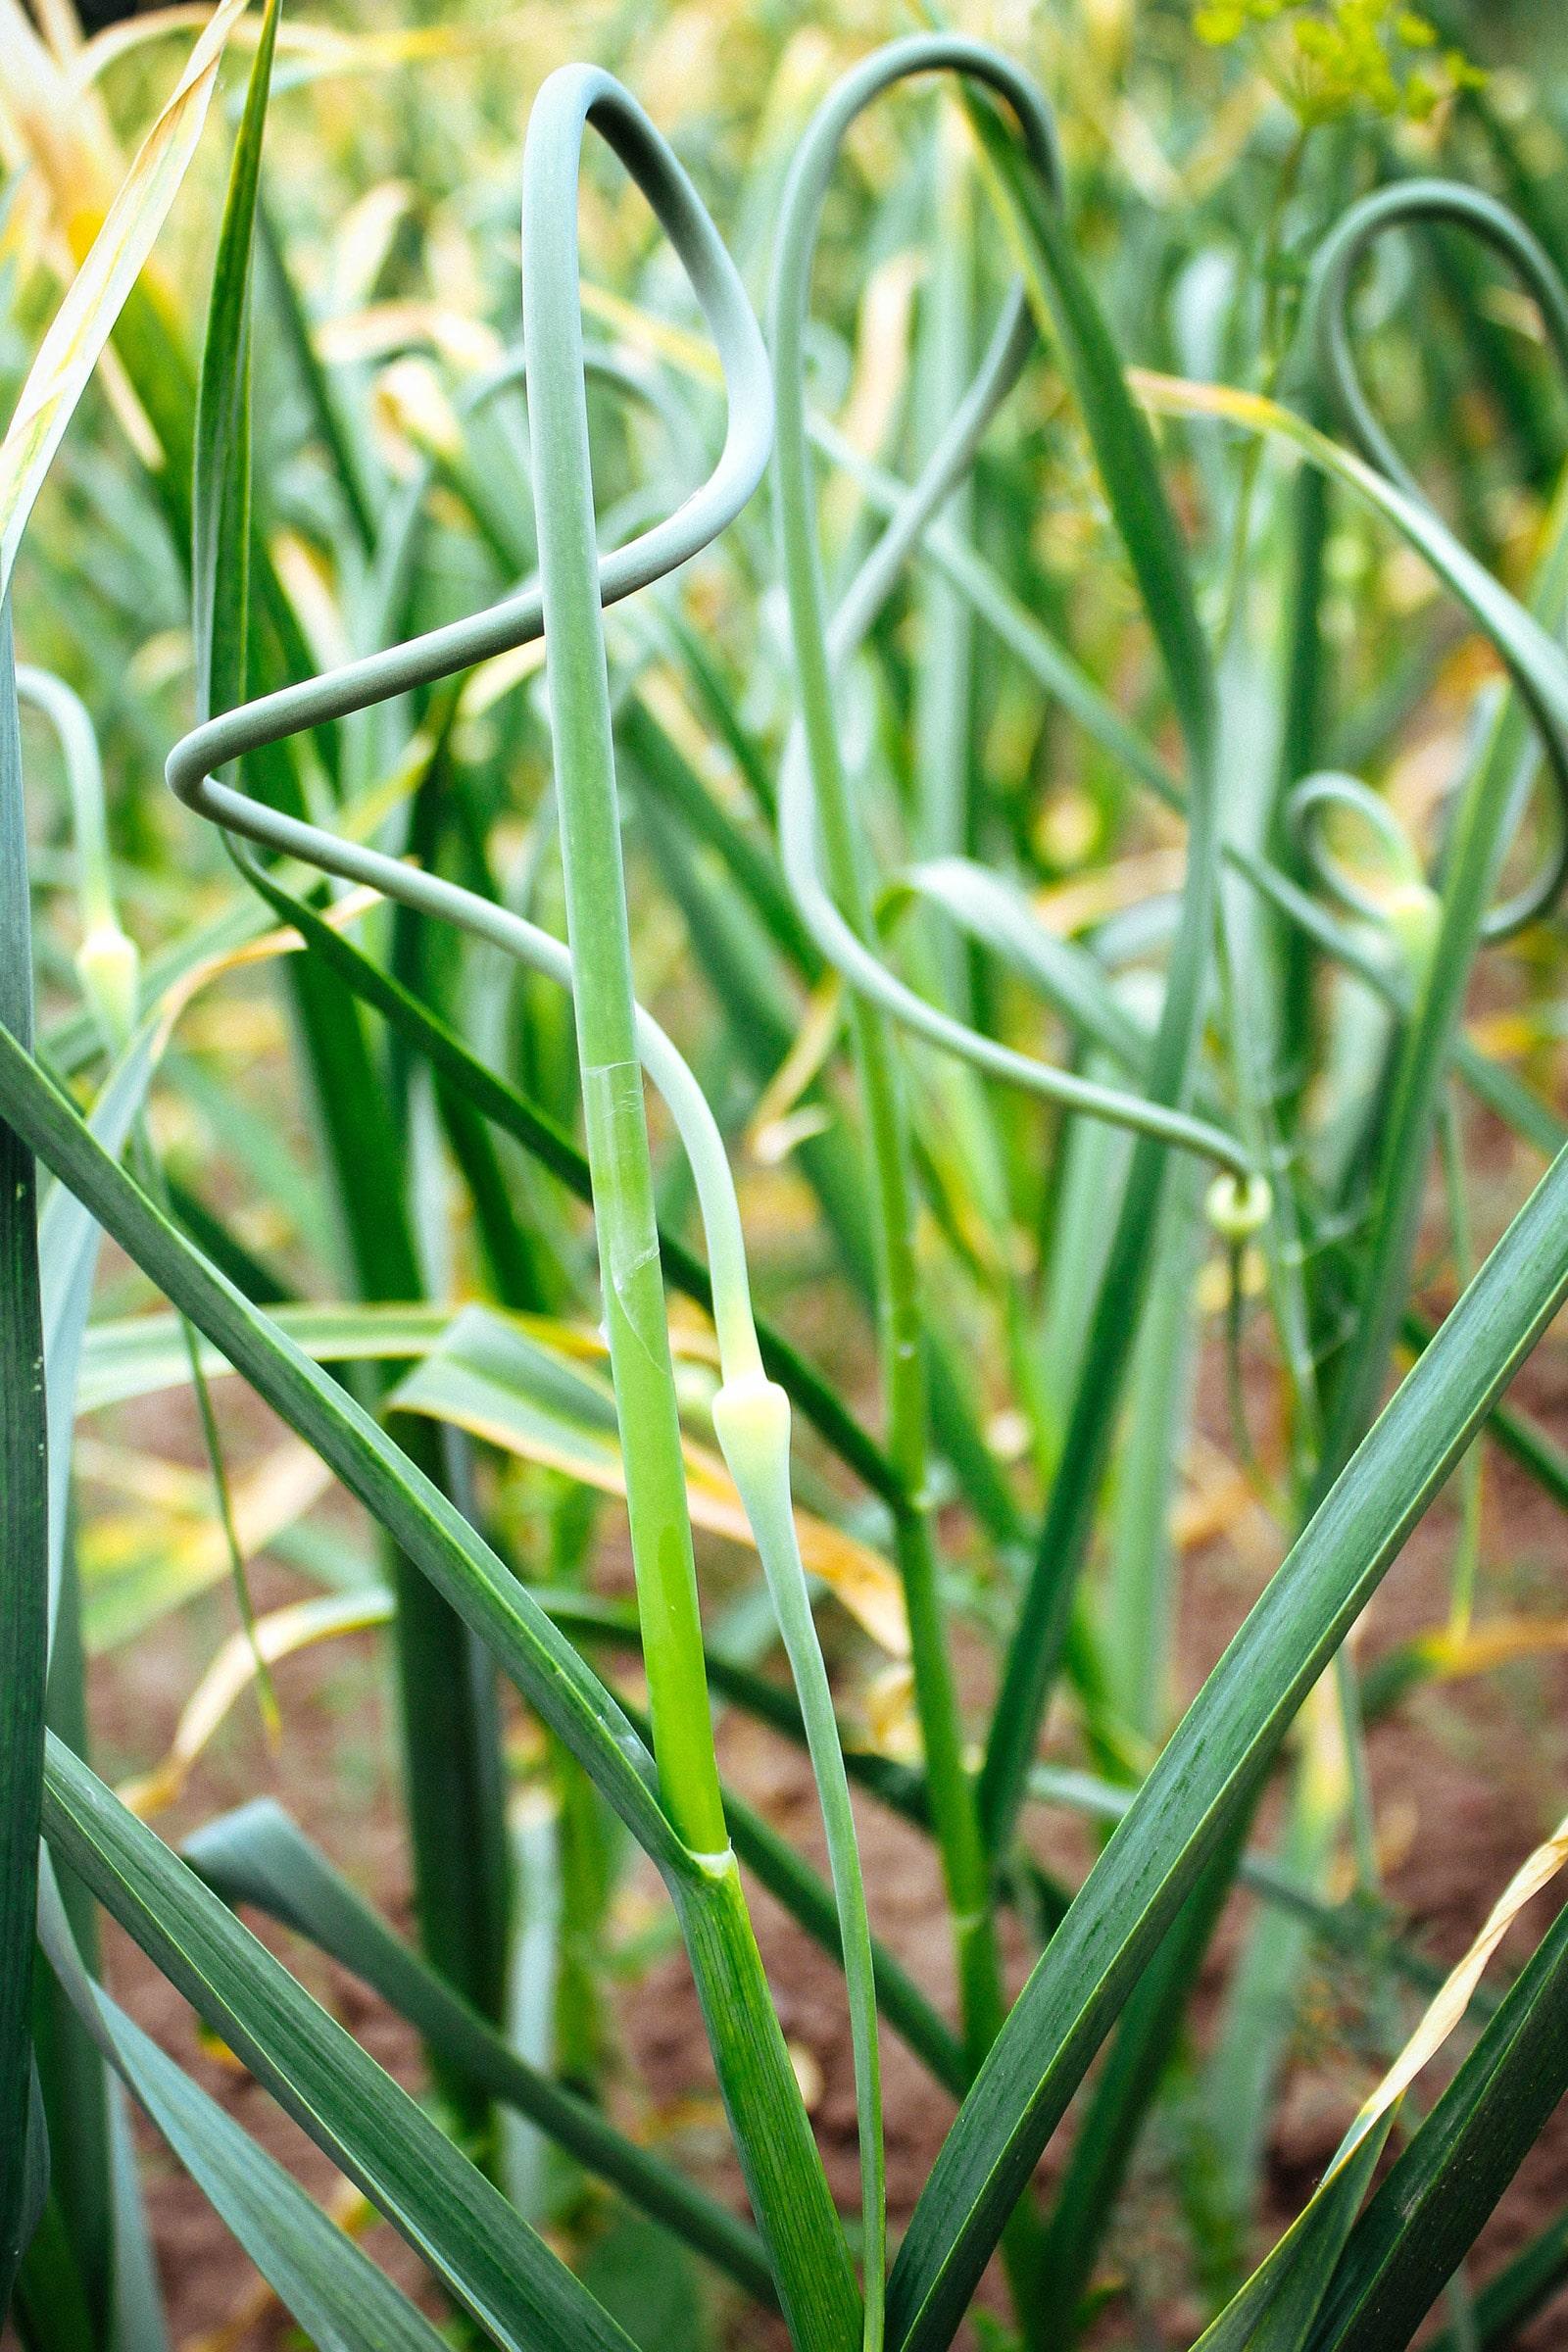 Scapes on hardneck garlic plants